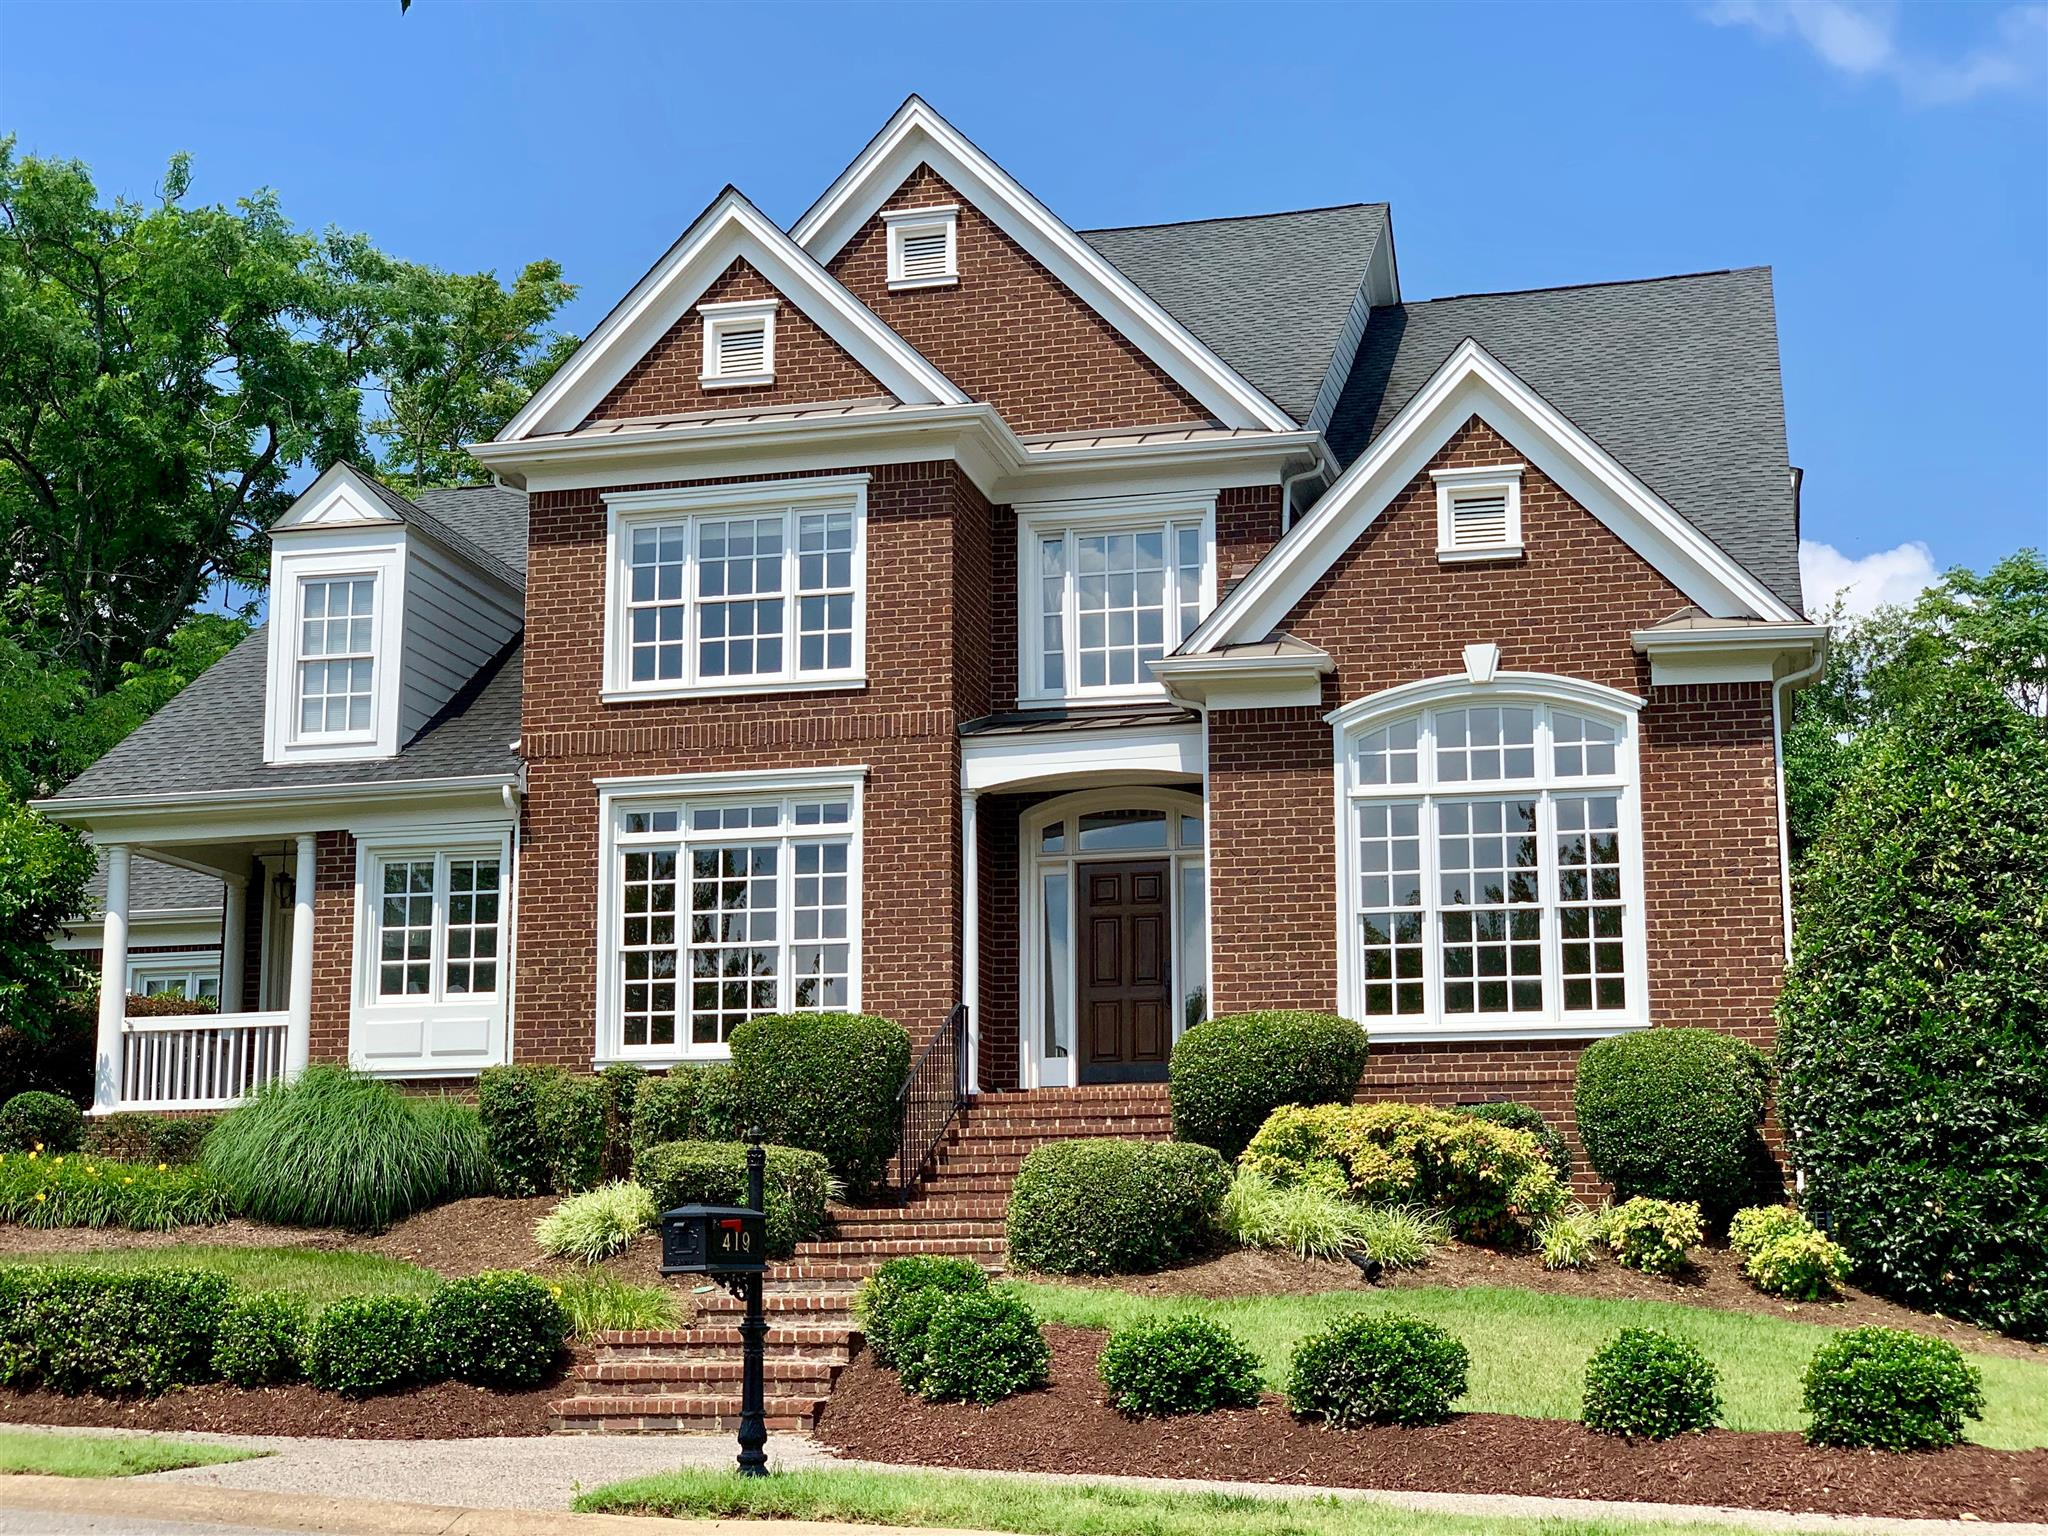 419 Autumn Lake Trail, Franklin, TN 37067 - Franklin, TN real estate listing